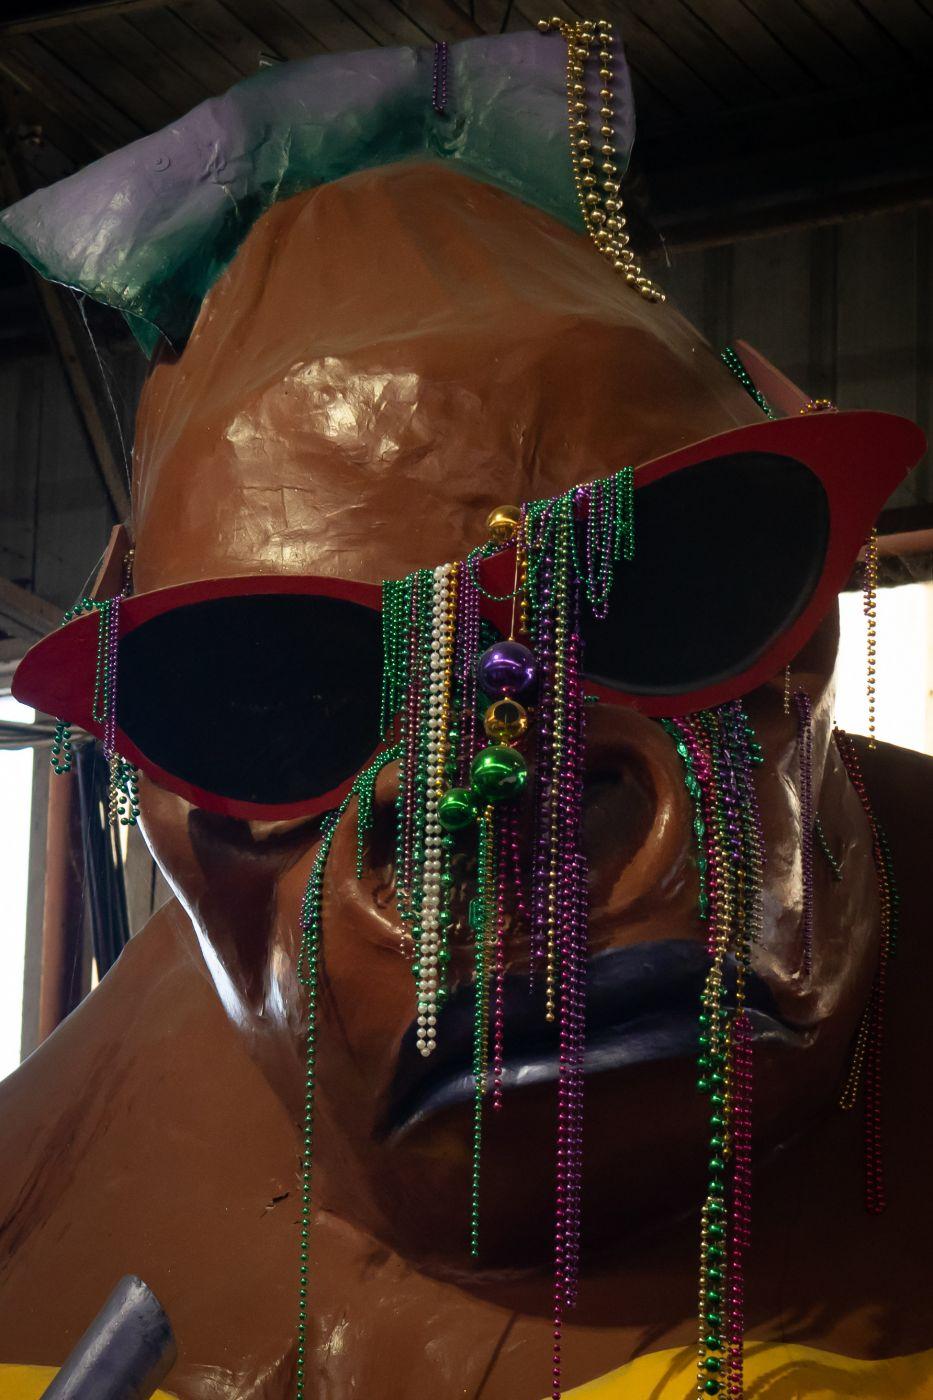 Mardi Gras World, USA